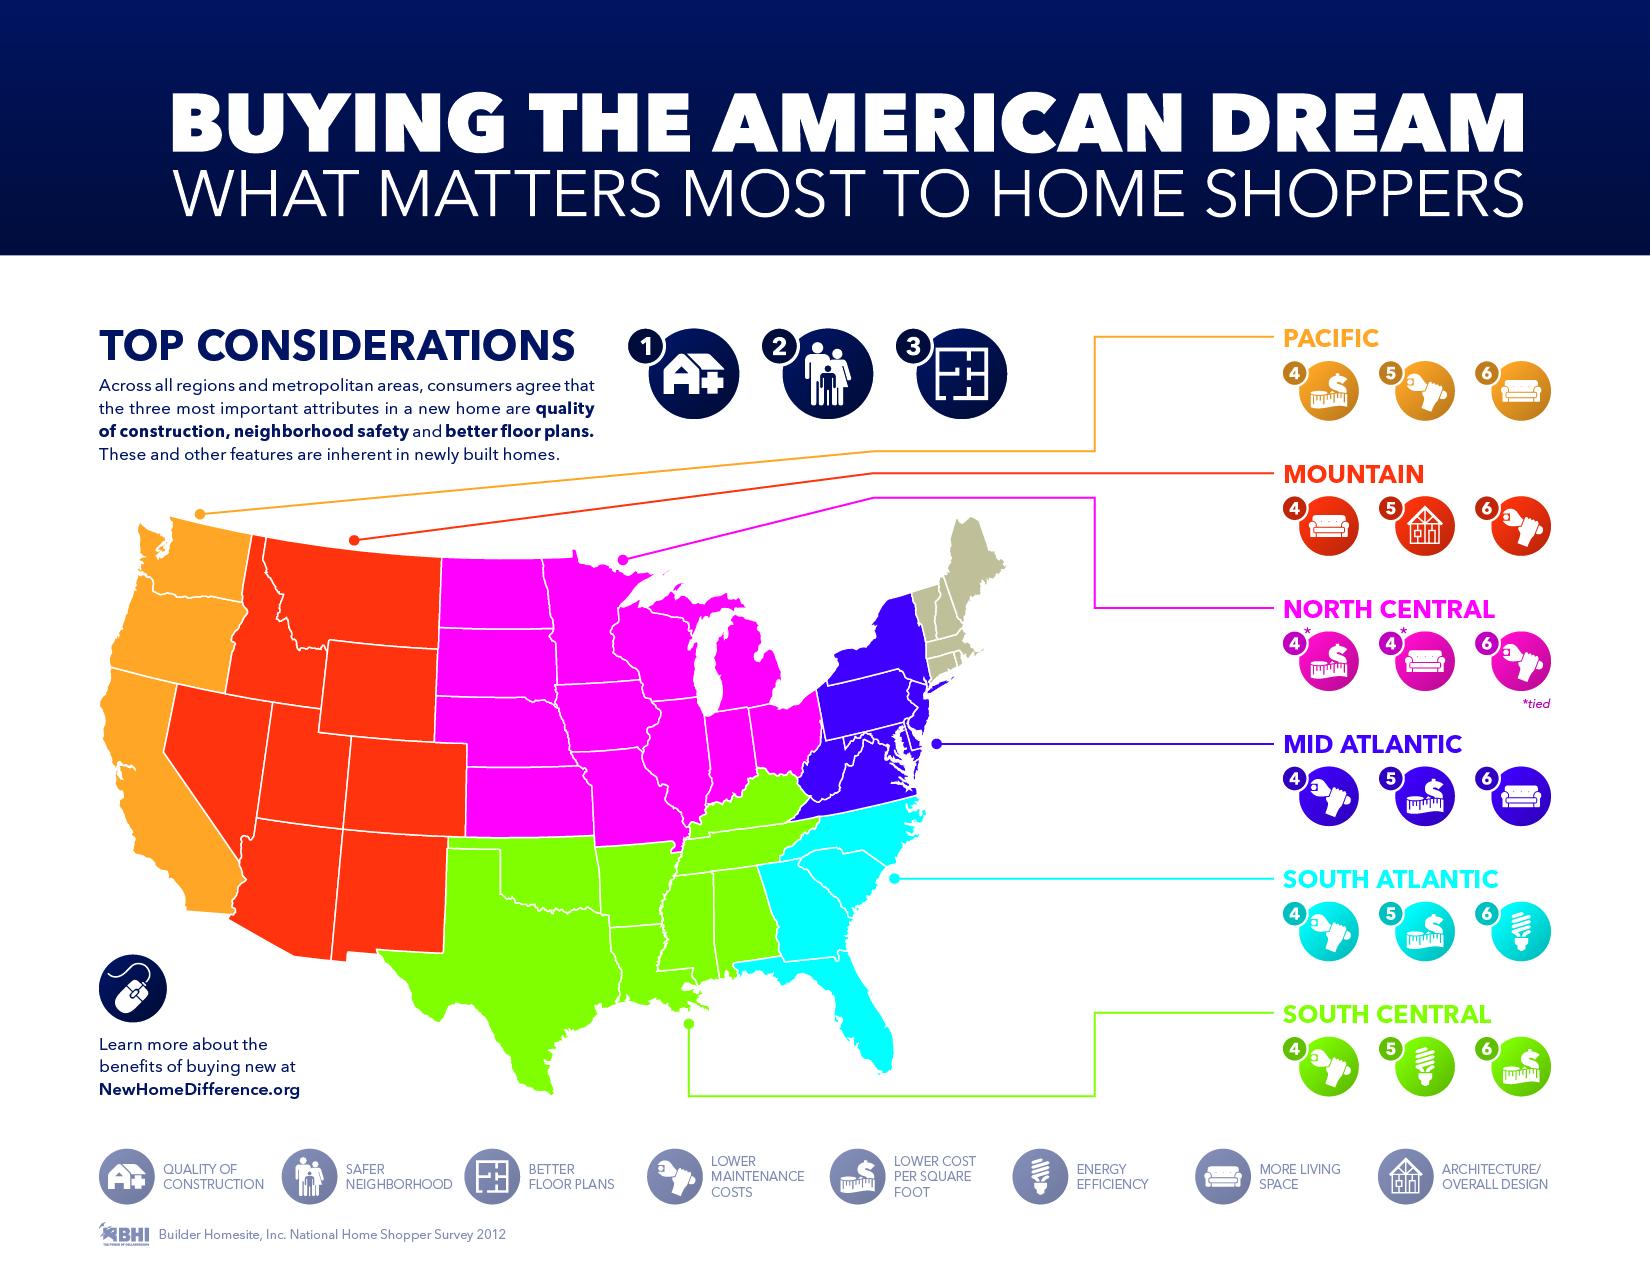 BuyingTheAmericanDreamWhatMattersMosttoHomeShoppers_5097e05a7c0de